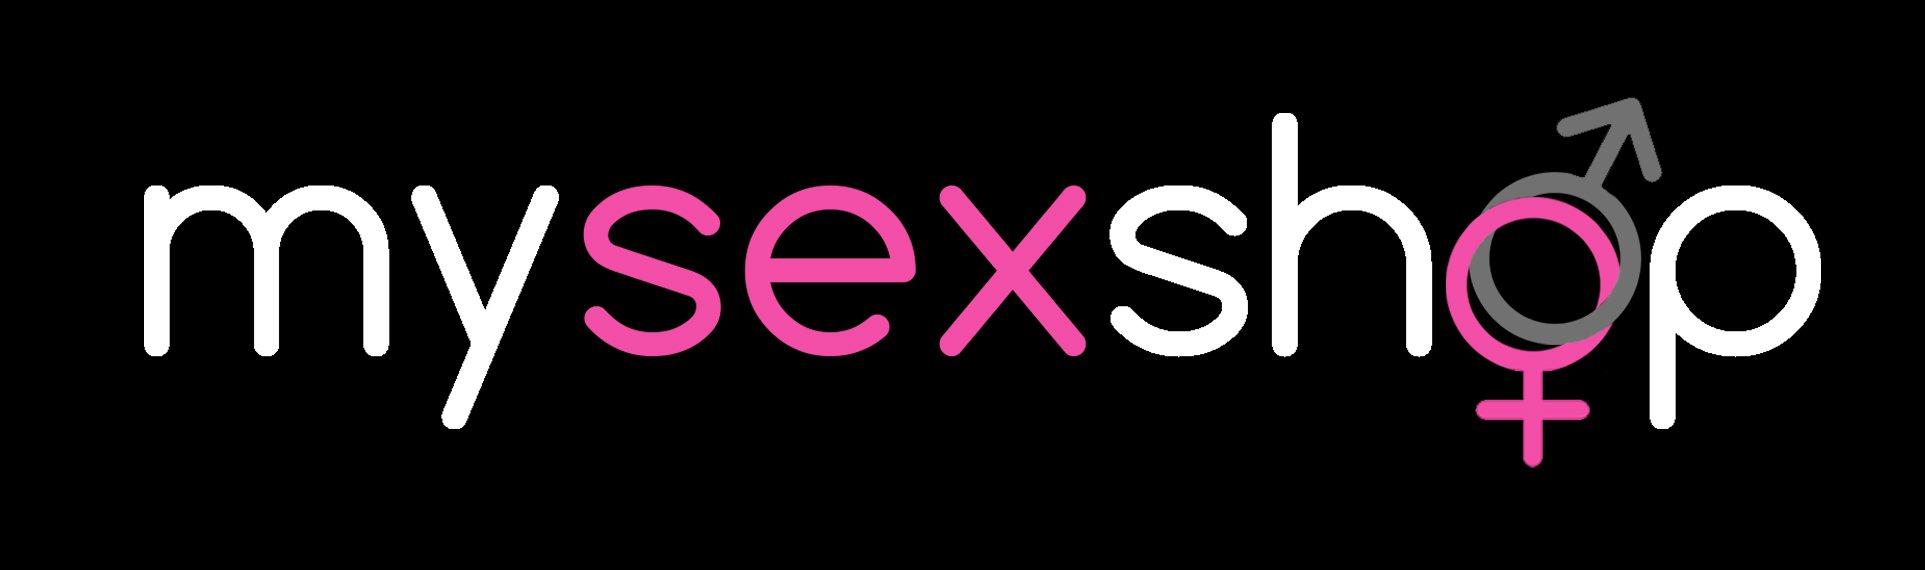 MySexShop